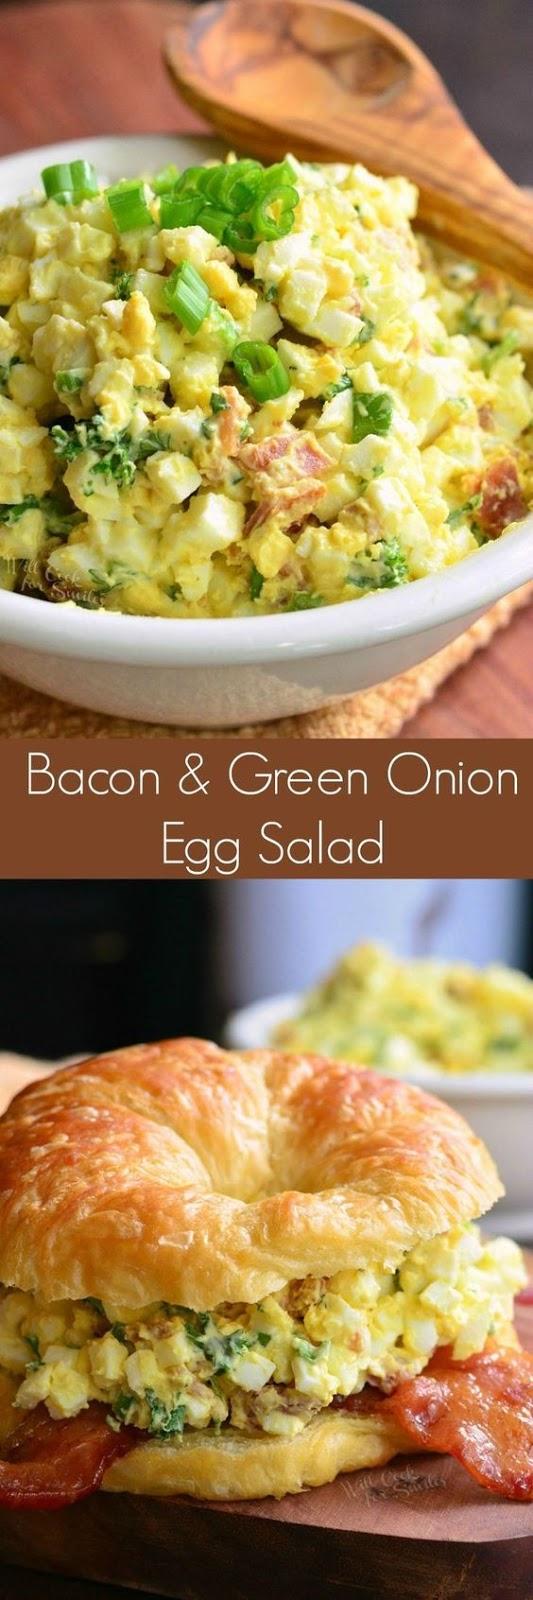 Bacon and Green Onion Egg Salad